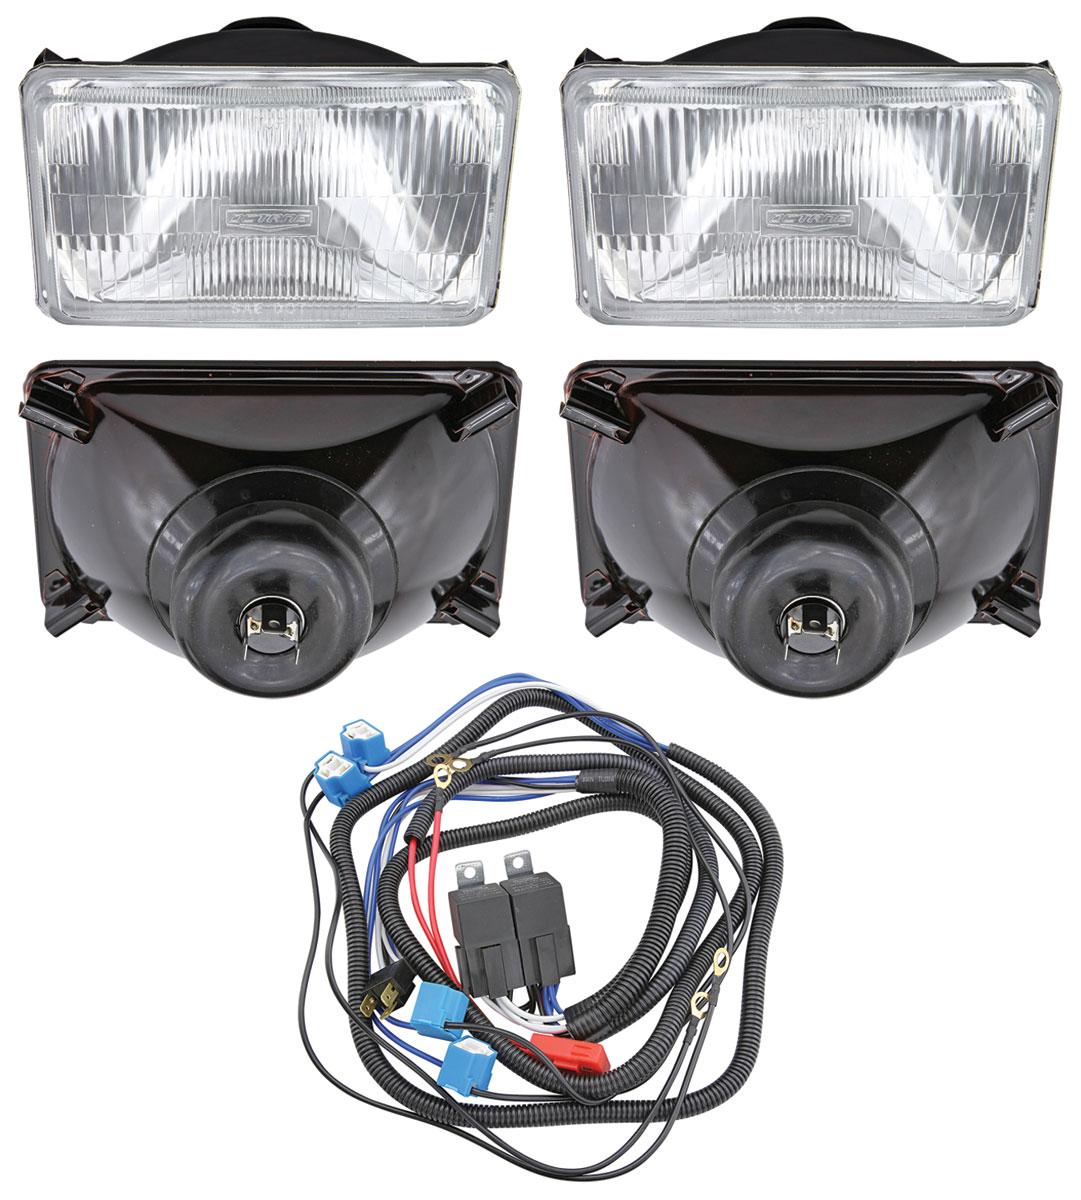 Photo of H4 Headlight Upgrade Kit four 55/60 H4 headlights & harness